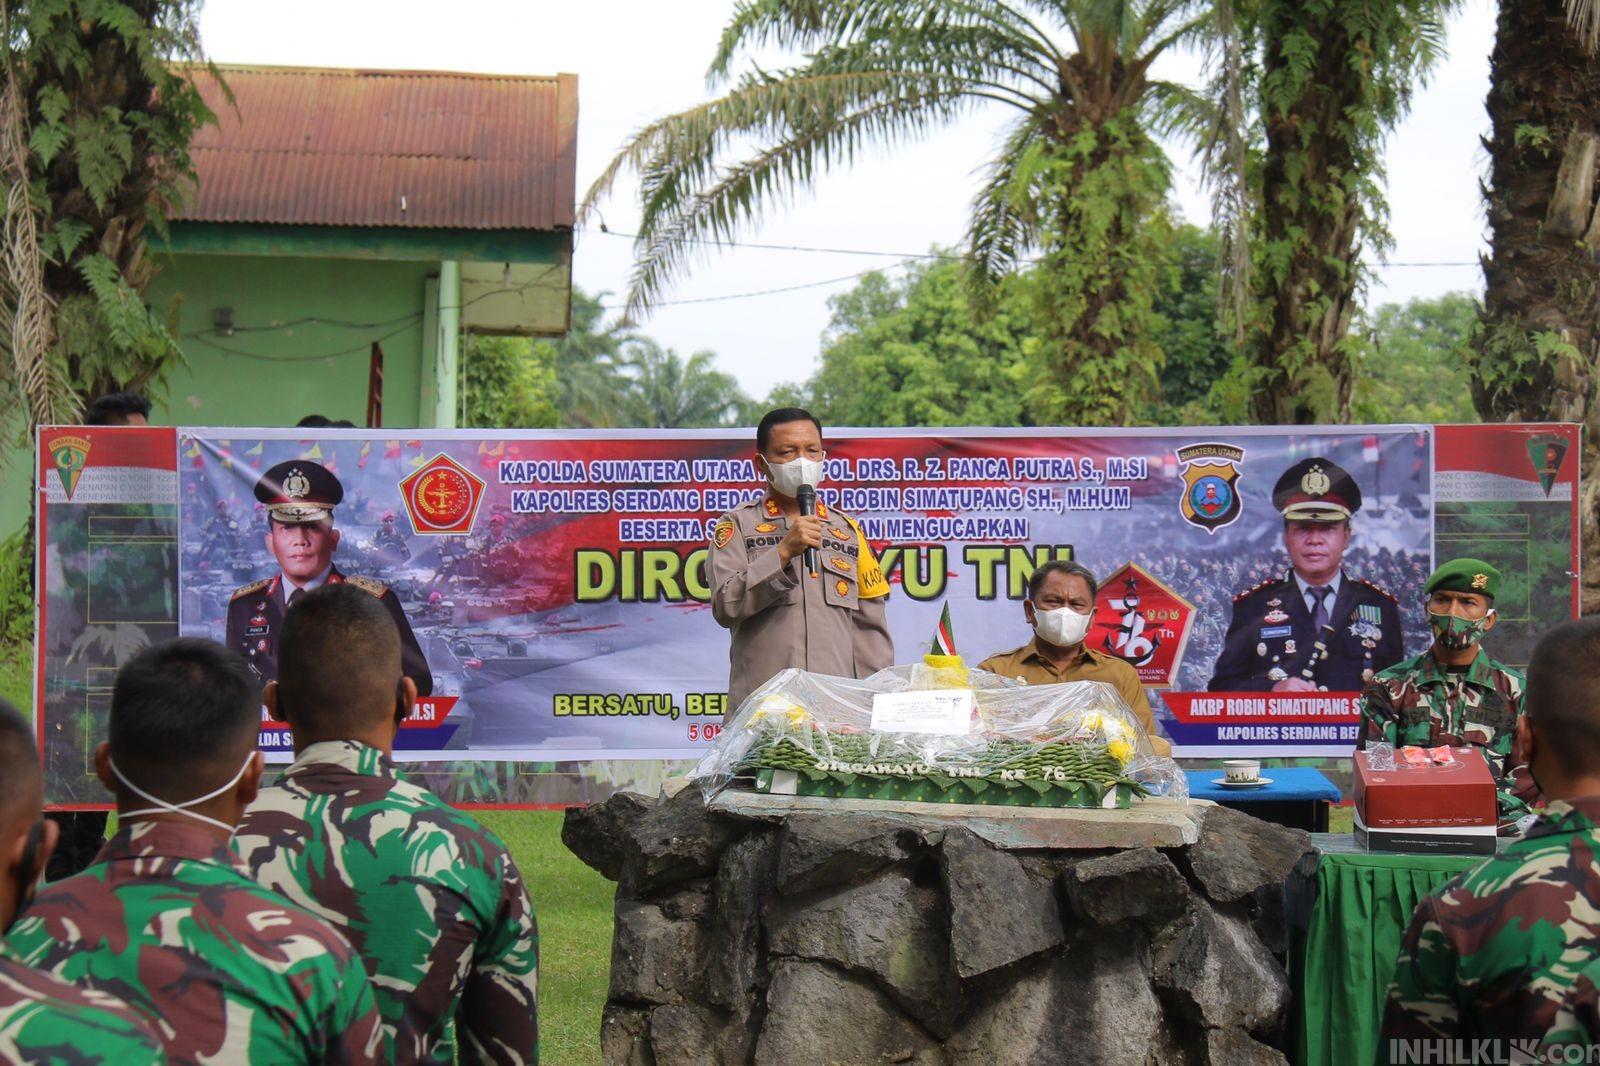 Syukuran HUT Ke-76 TNI, Kapolres Sergai Kunjungi KompoB/C Batalyon 122 TS